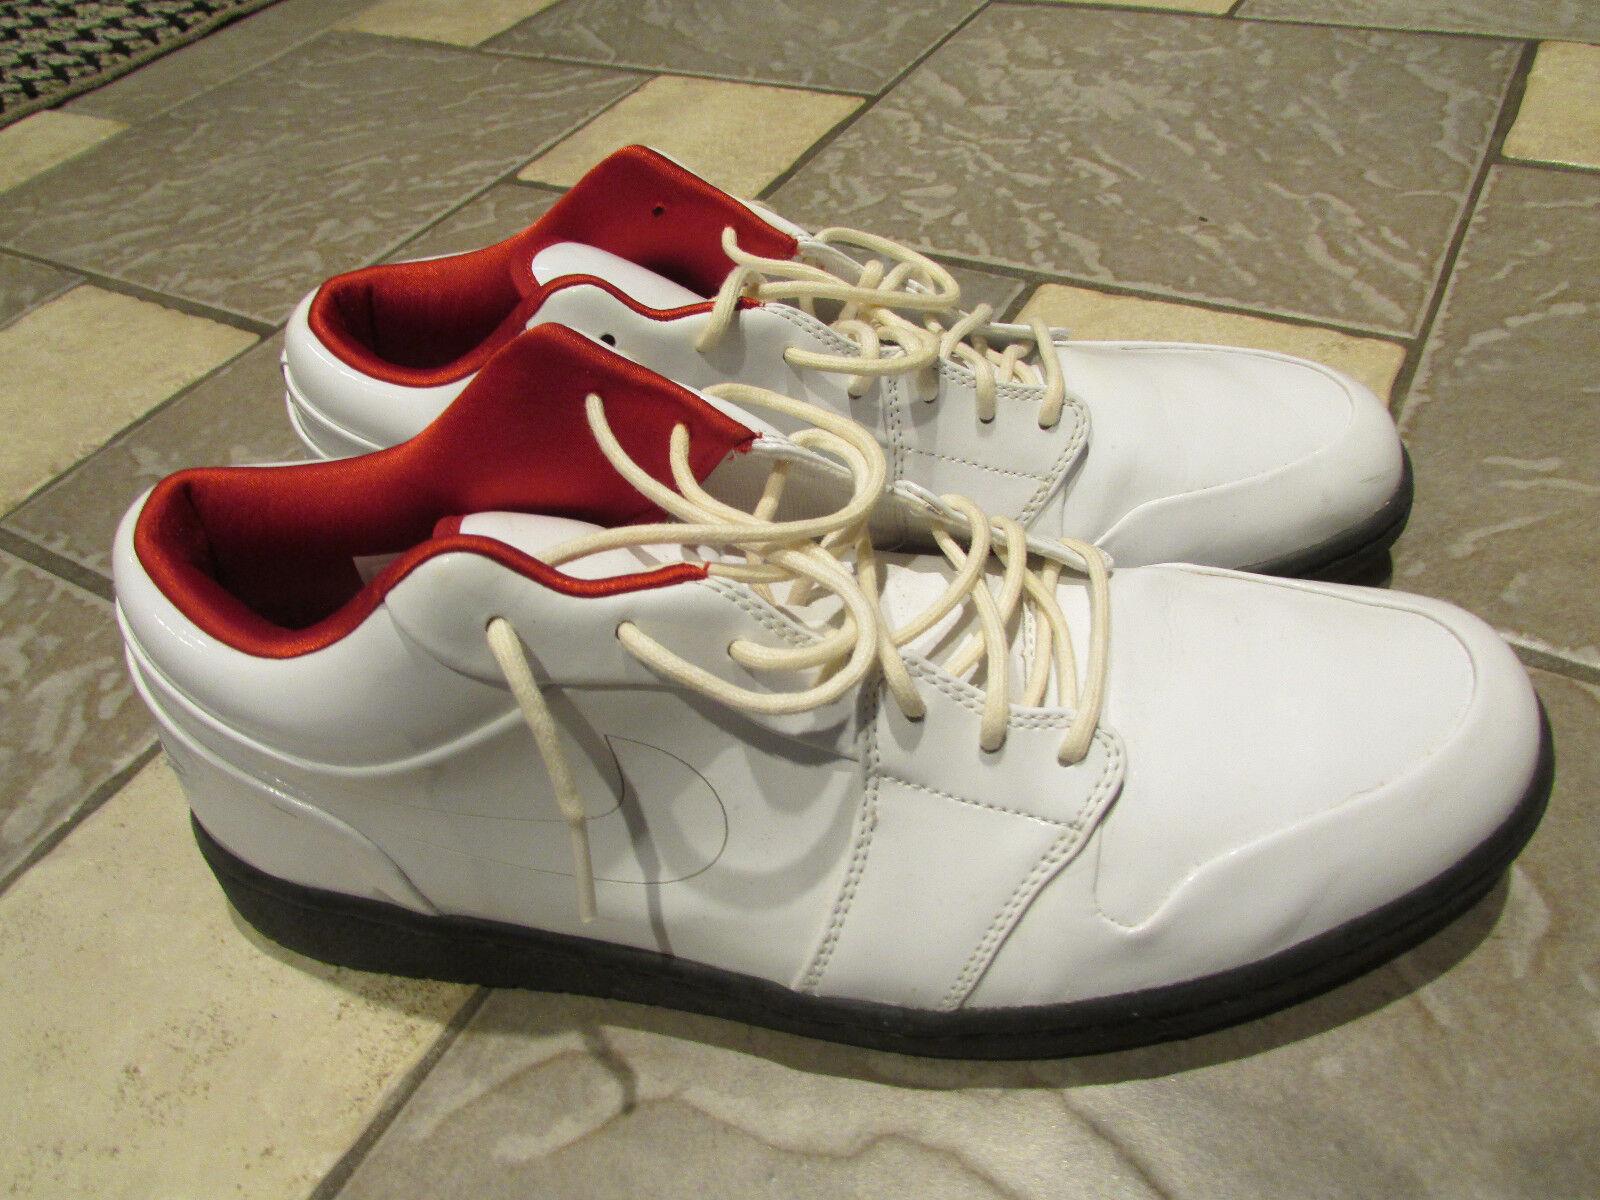 Nike scarpe air jordan phat basso smoking scarpe Nike da ginnastica bianche Uomo 14 365763 664dab